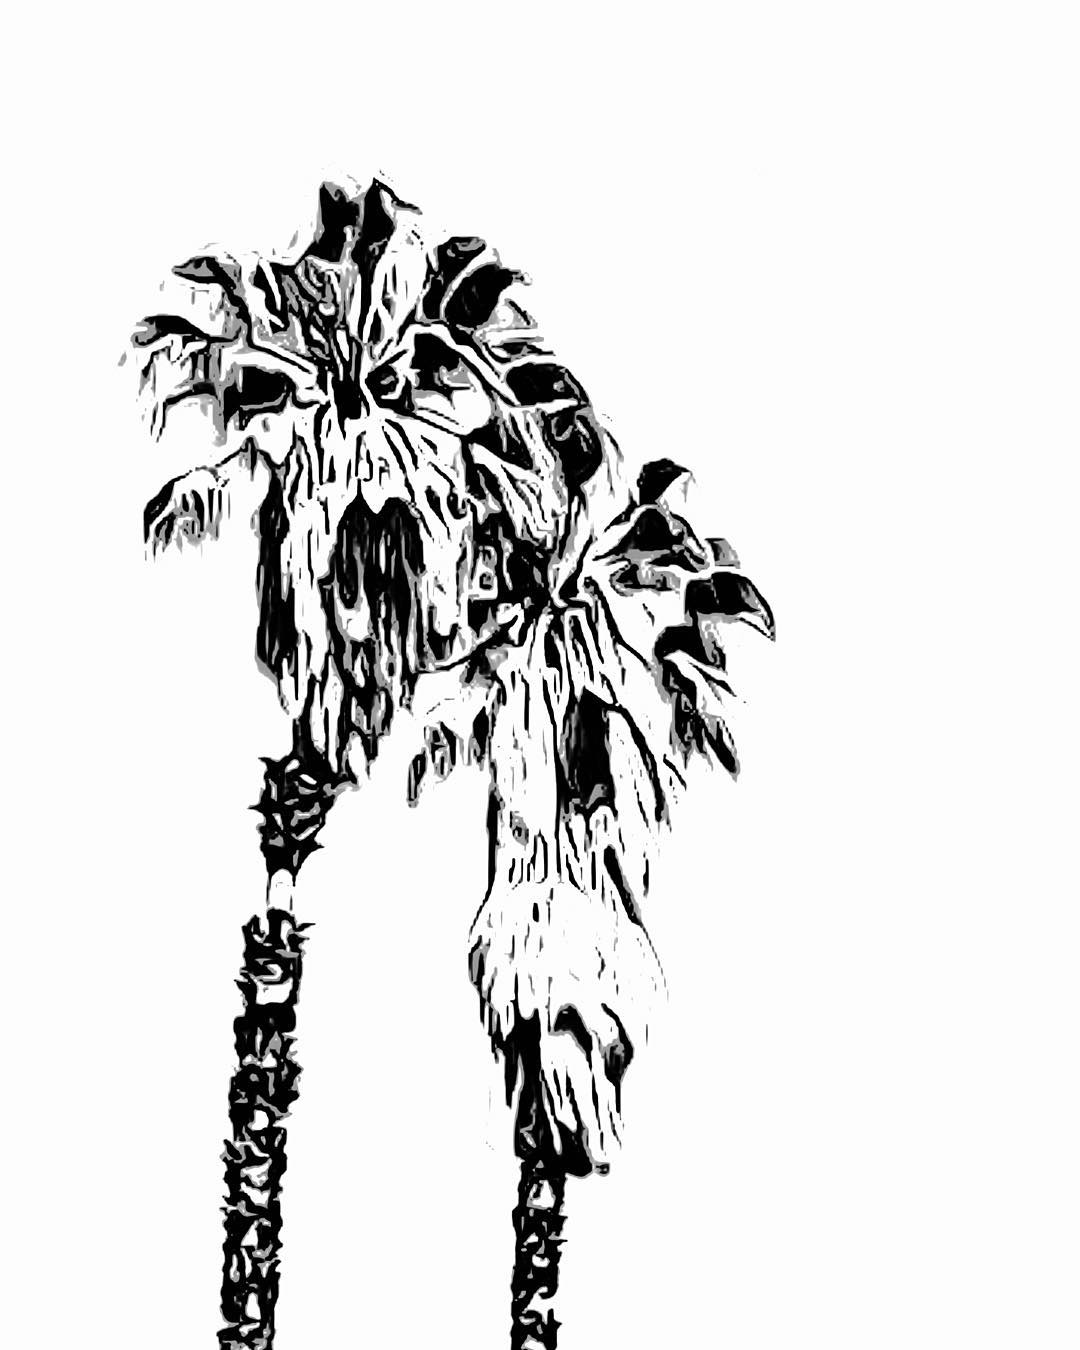 1080x1350 My Word With Douglas E. Welch Palm Trees Via